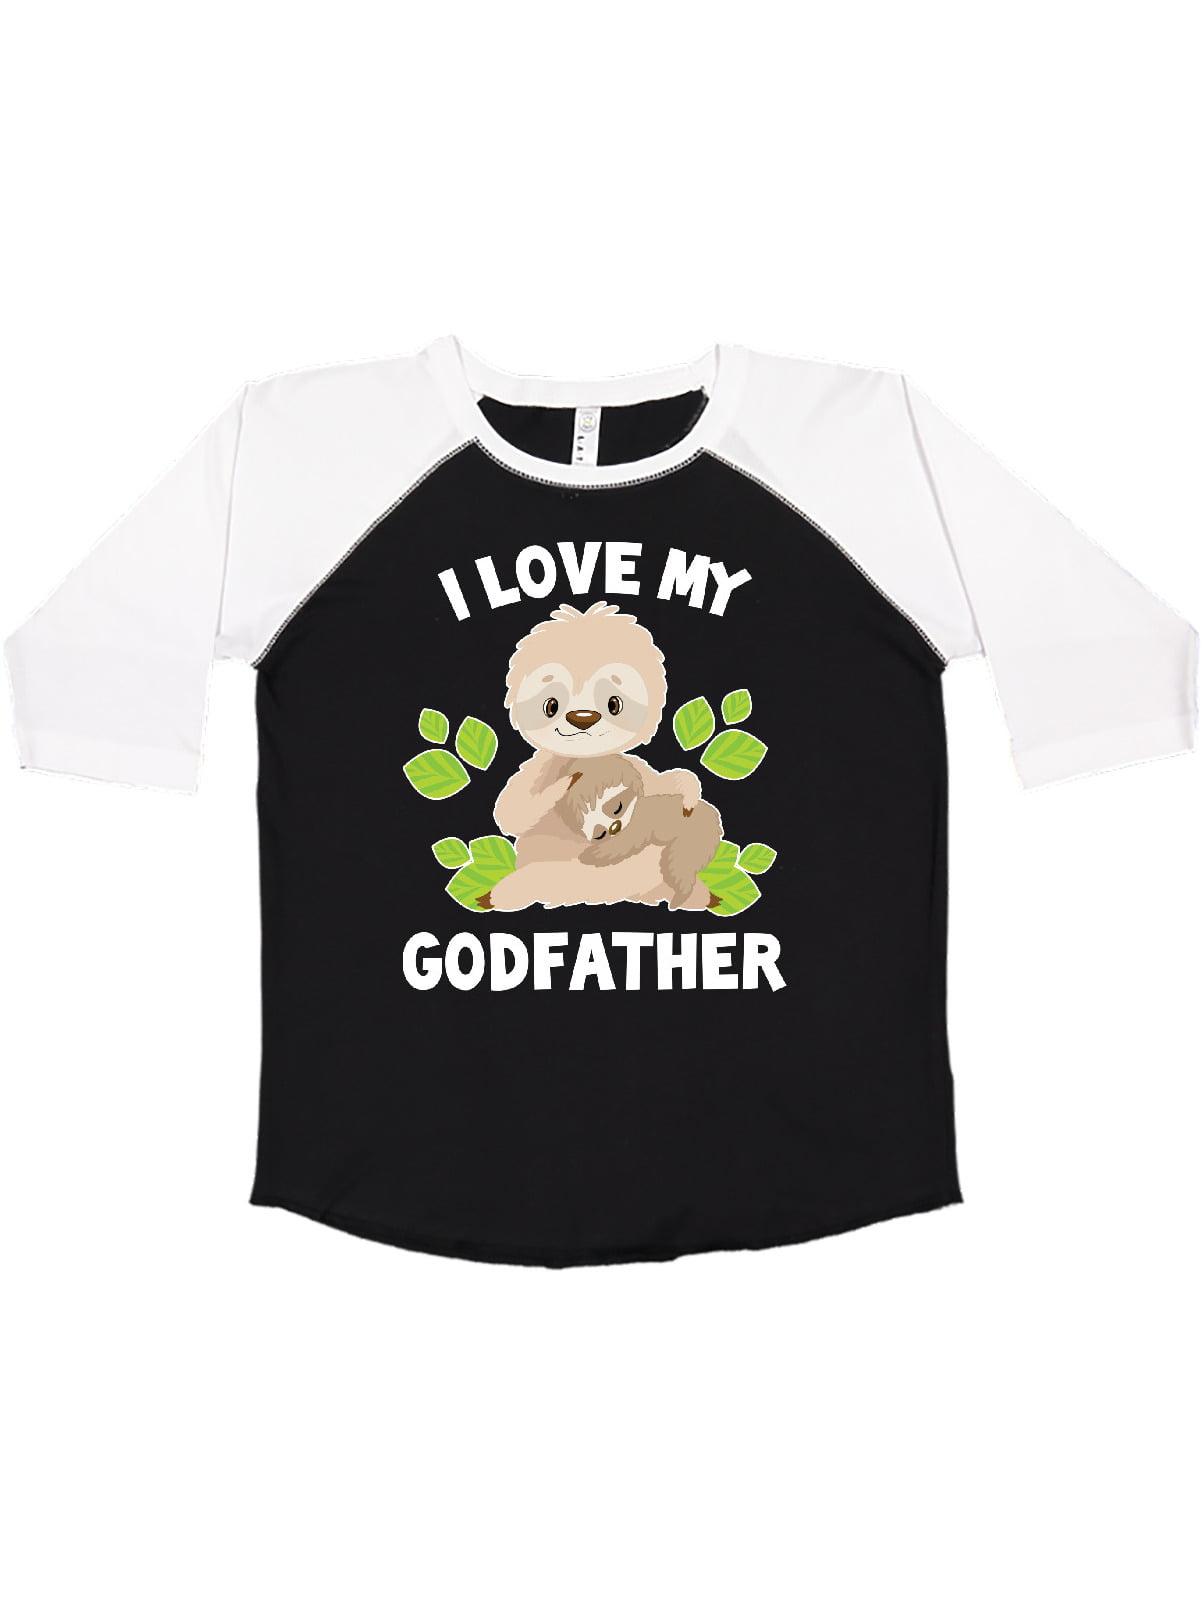 Toddler//Kids Sweatshirt I Love My Godfather So Very Much